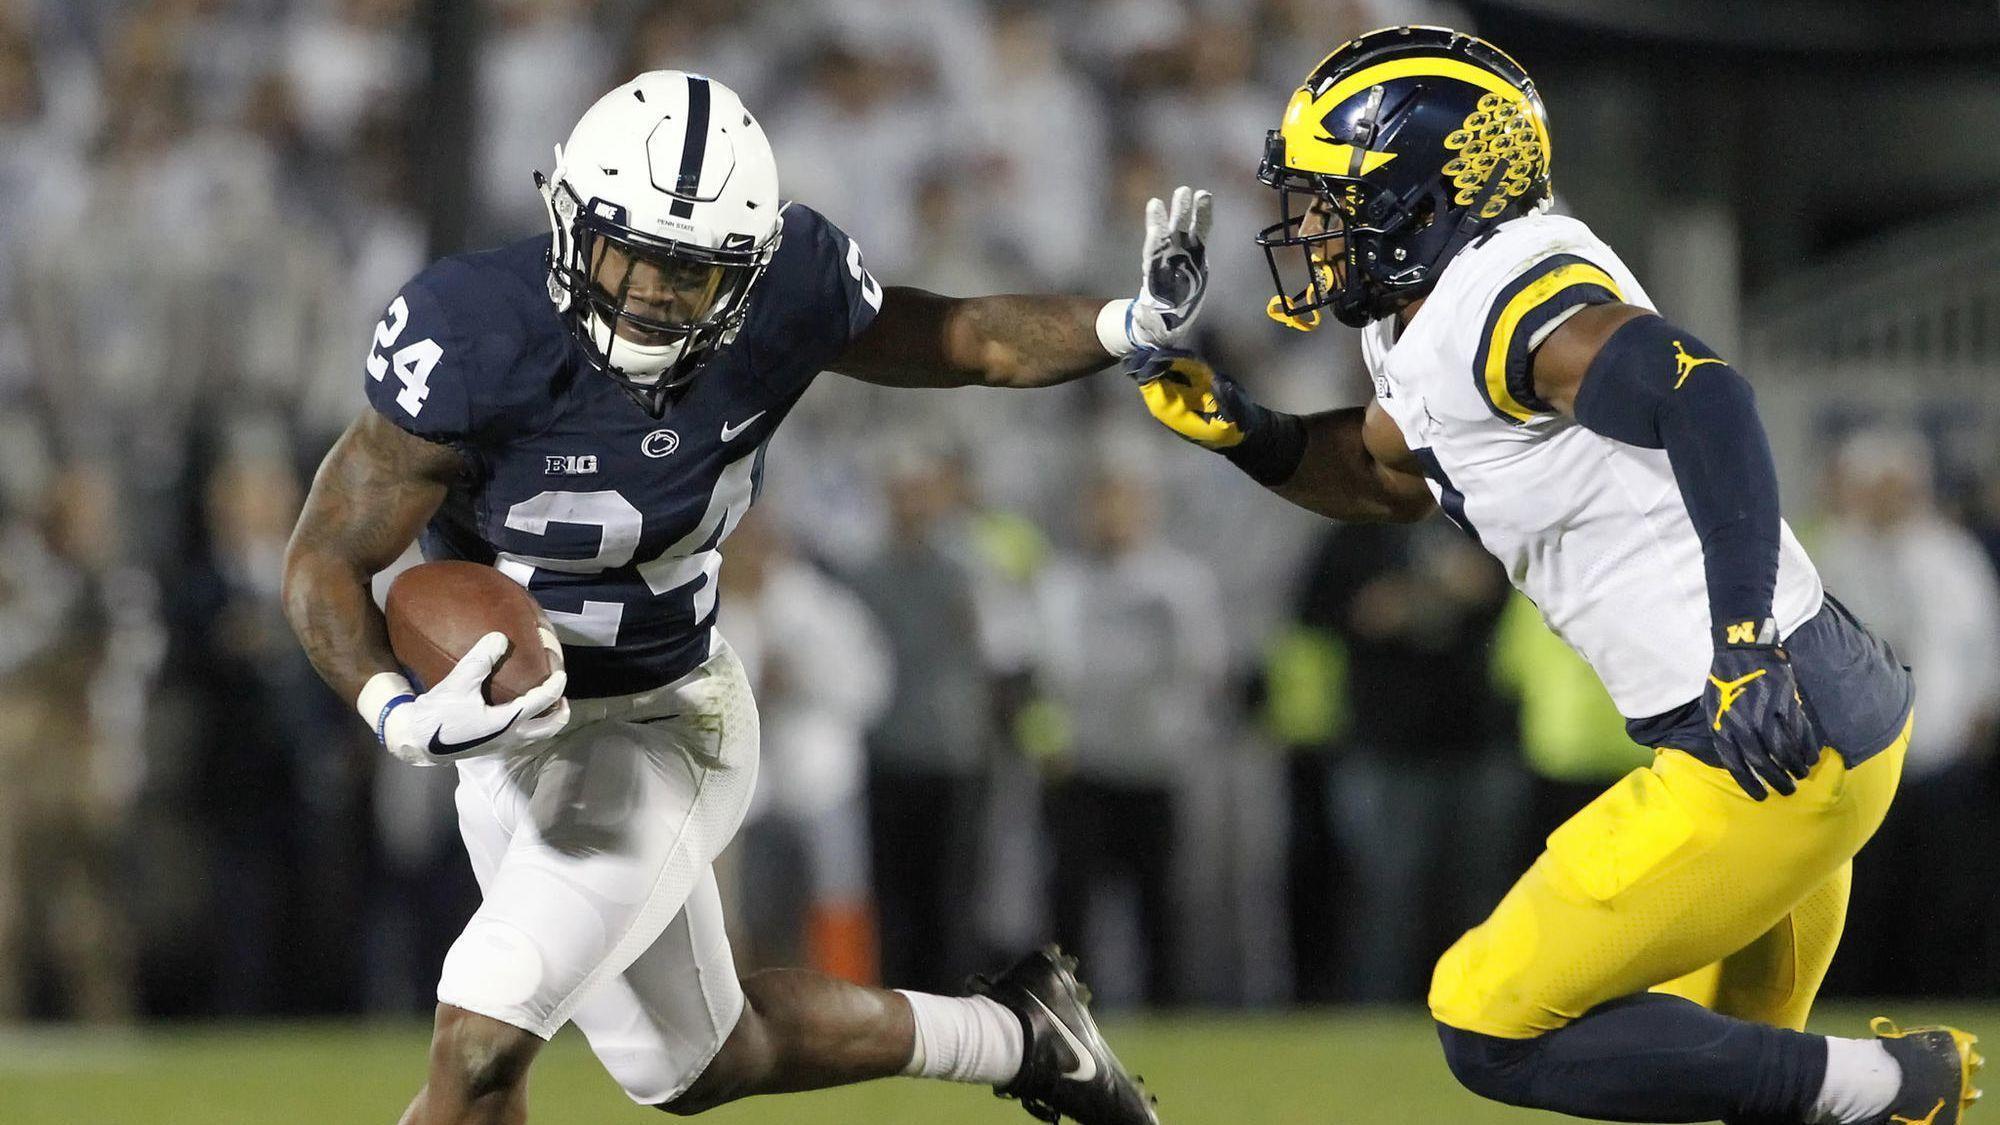 Ct-spt-college-football-preview-big-ten-replacing-stars-20180813